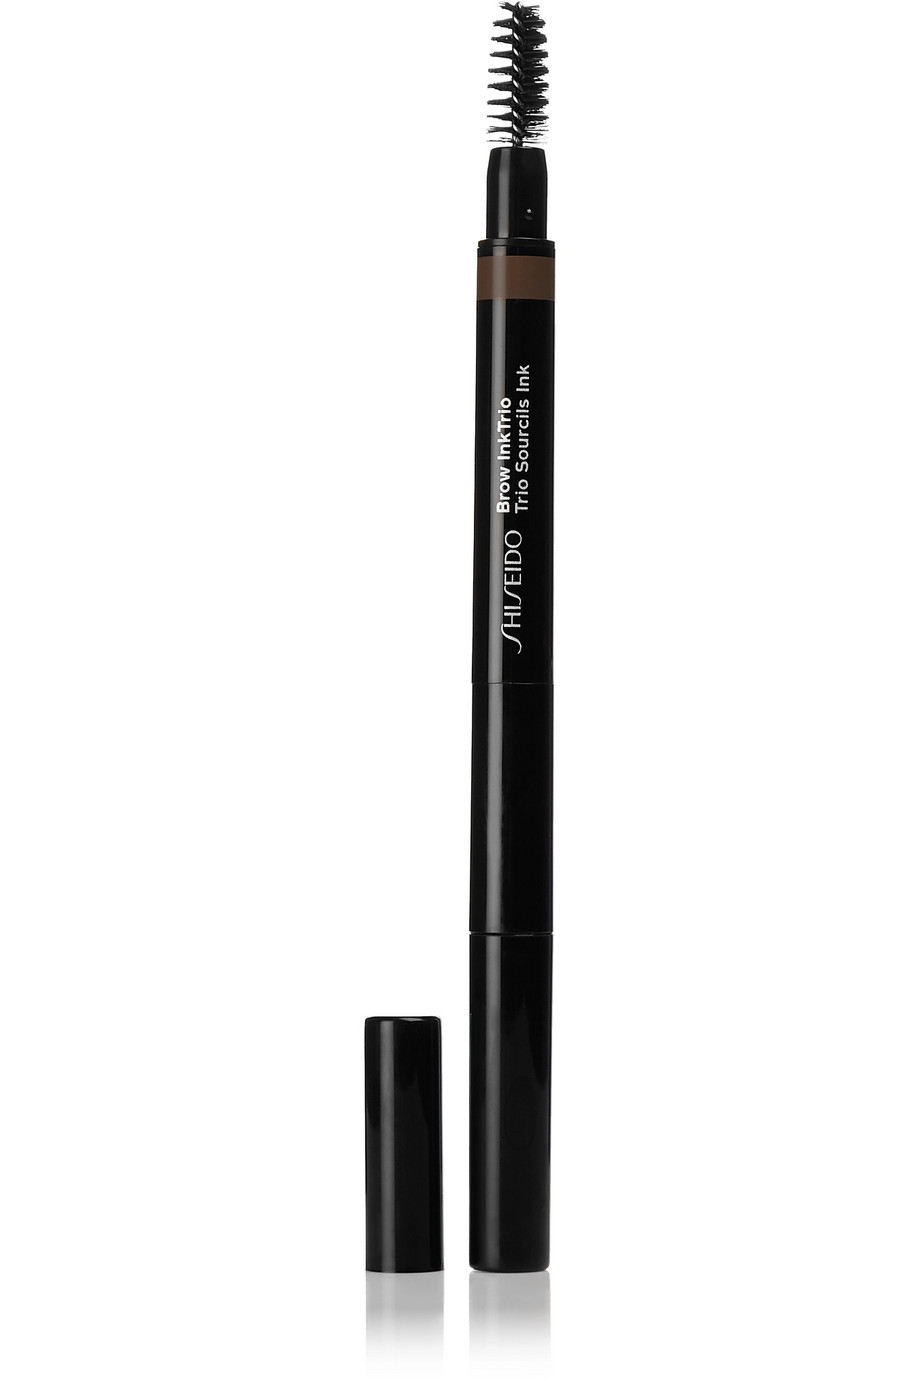 Shiseido Brow InkTrio – Deep Brown 03 – Augenbrauenstift